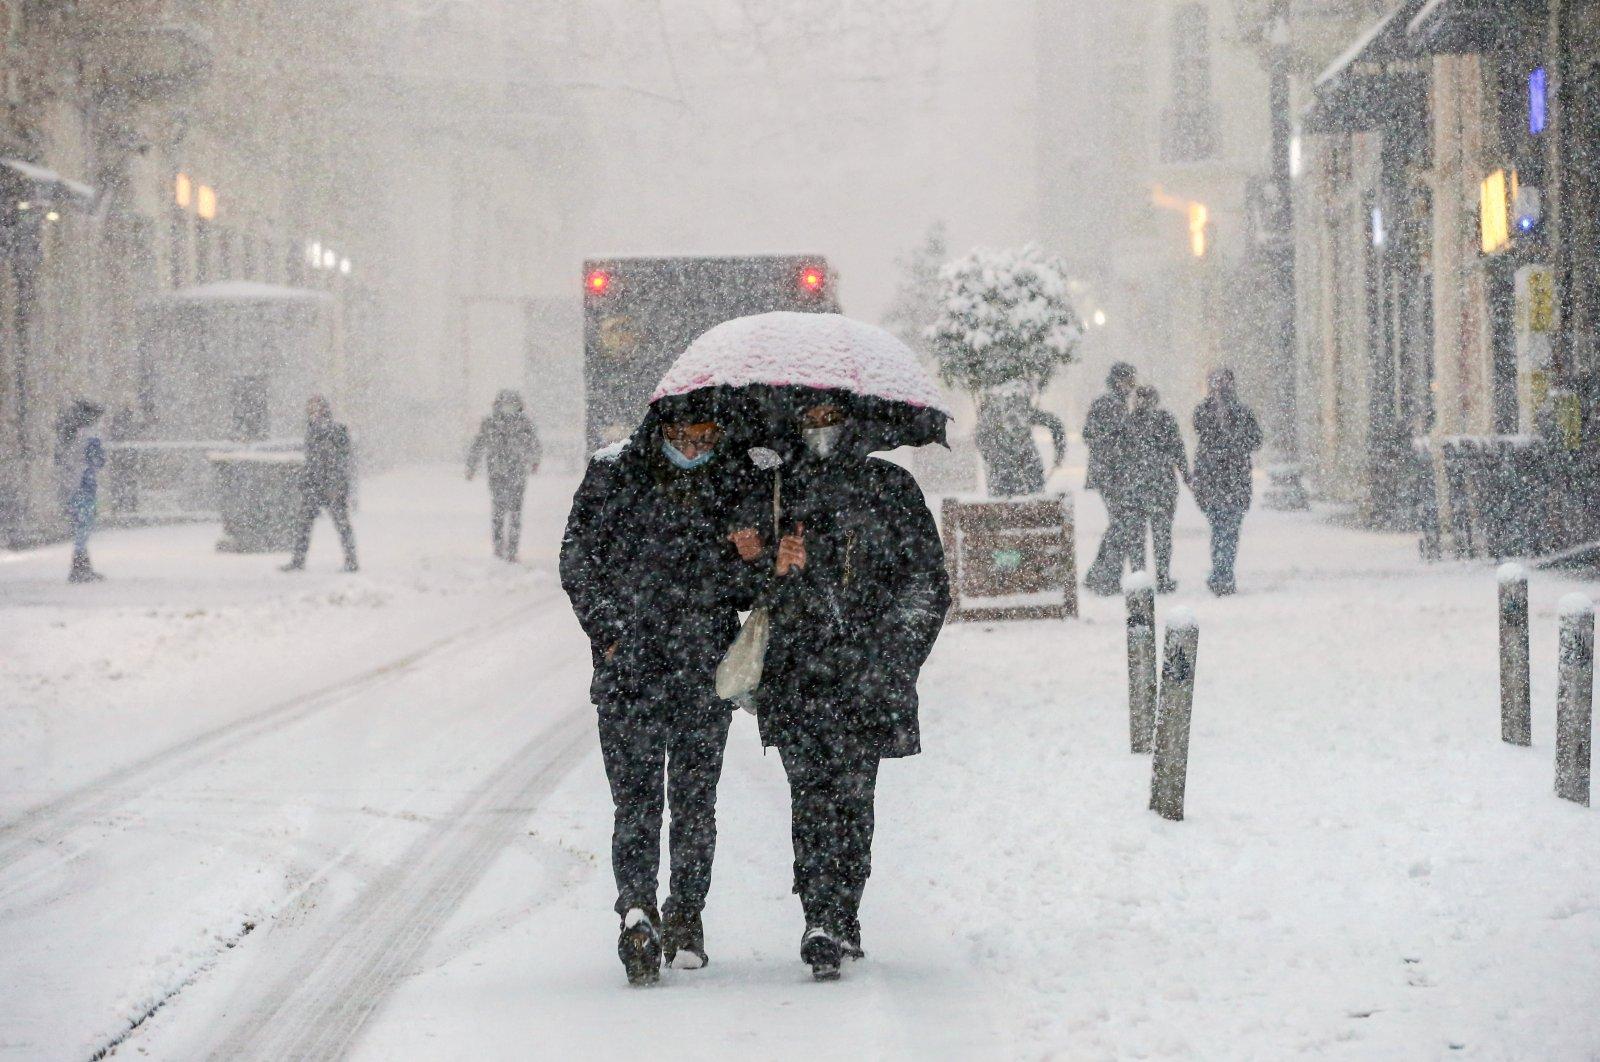 People walk along Istiklal Avenue as snow falls, in Istanbul, Turkey, Feb. 17, 2021. (AA Photo)